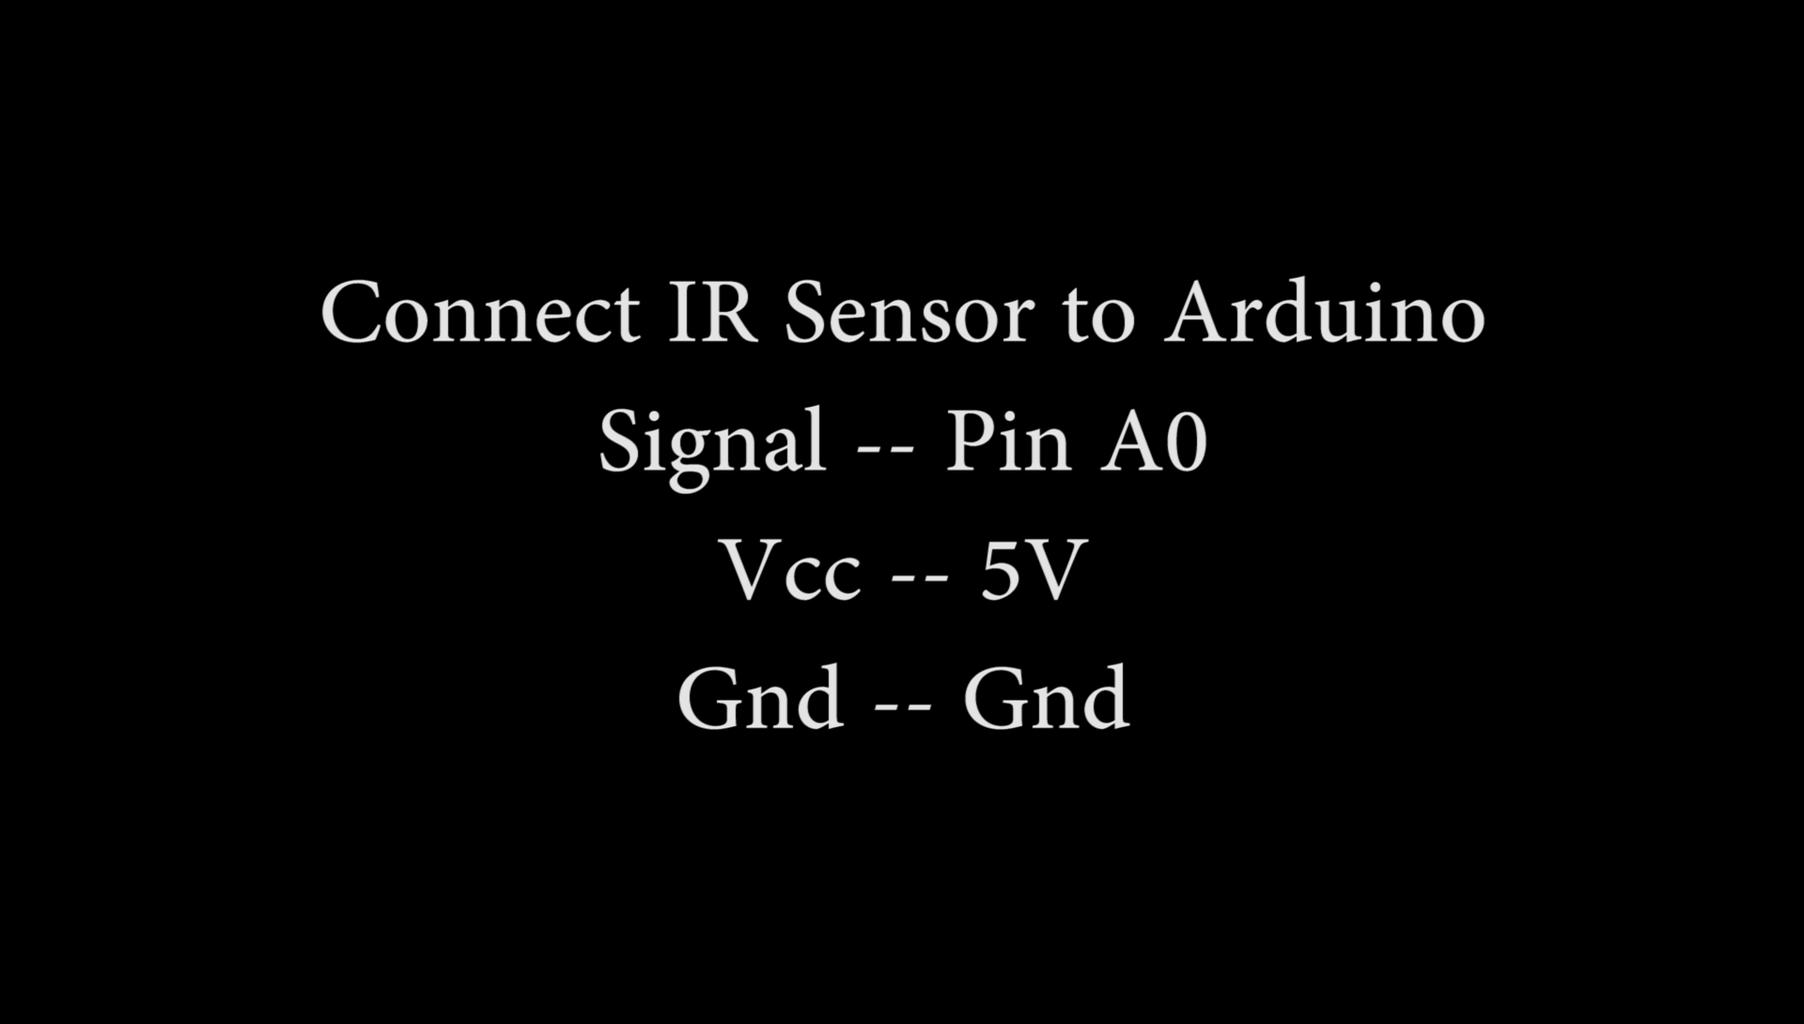 Connect the Proximity Sensor to Arduino